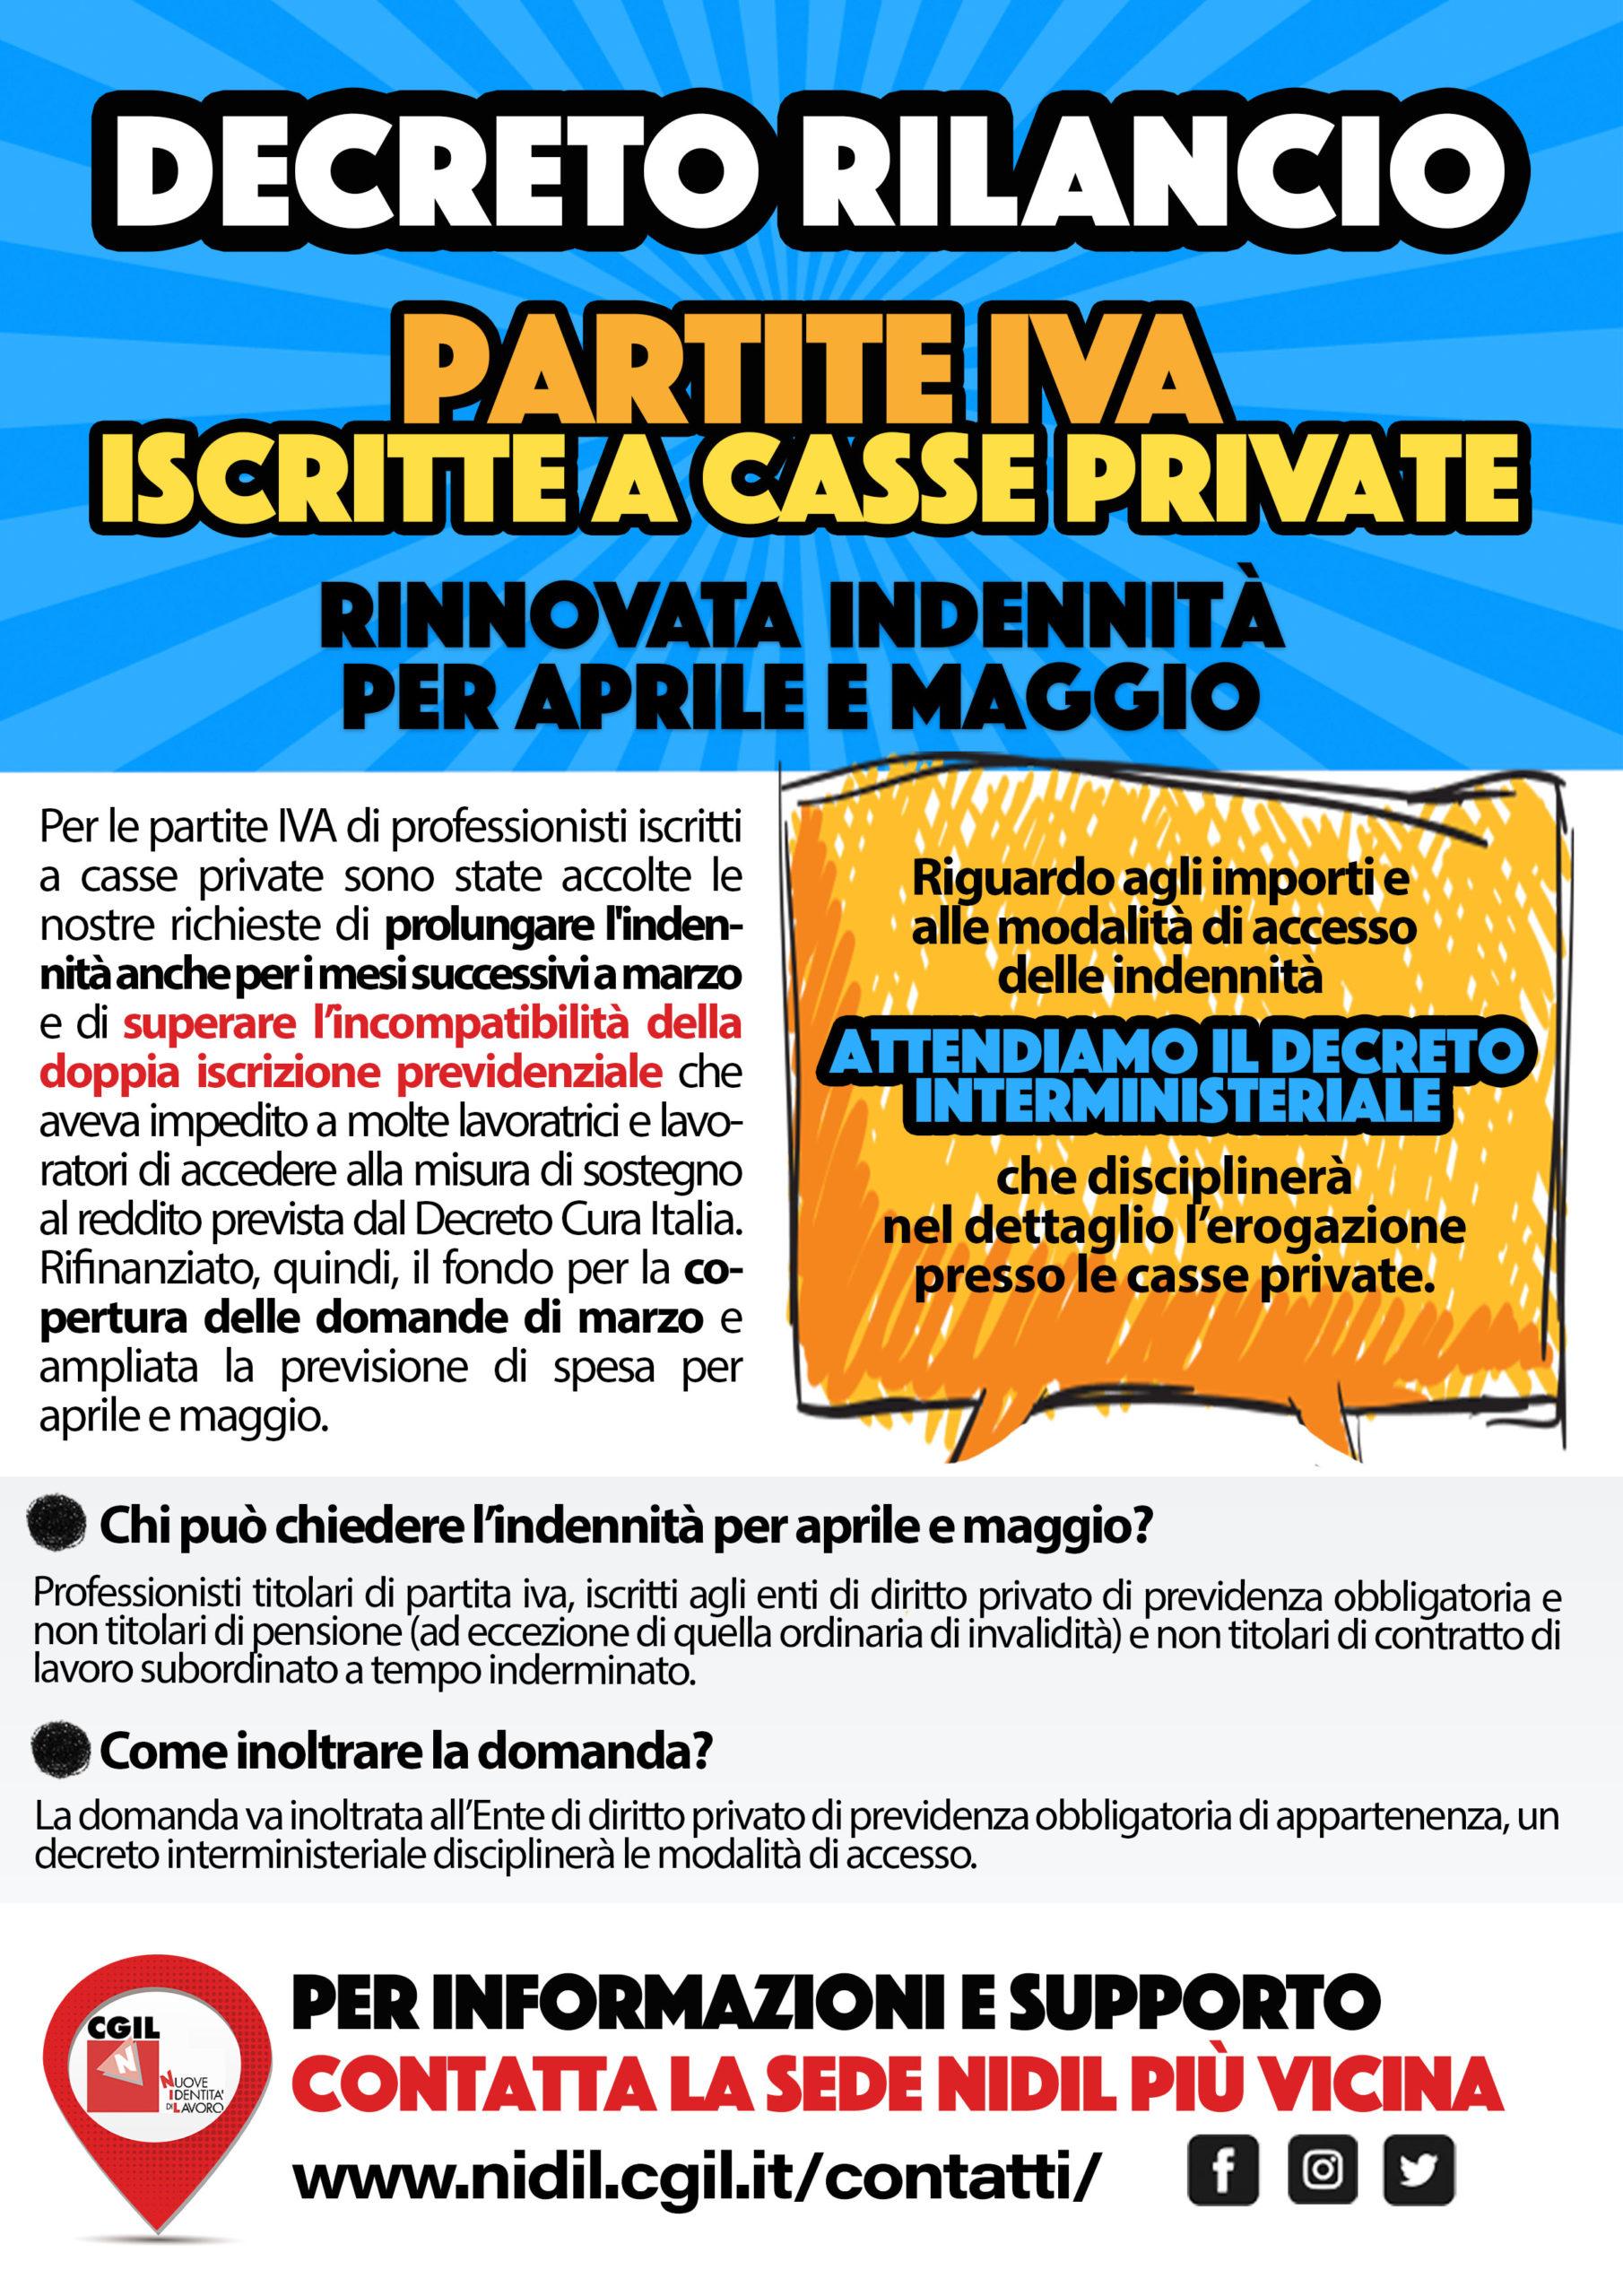 Decreto Rilancio Partite IVA Casse private